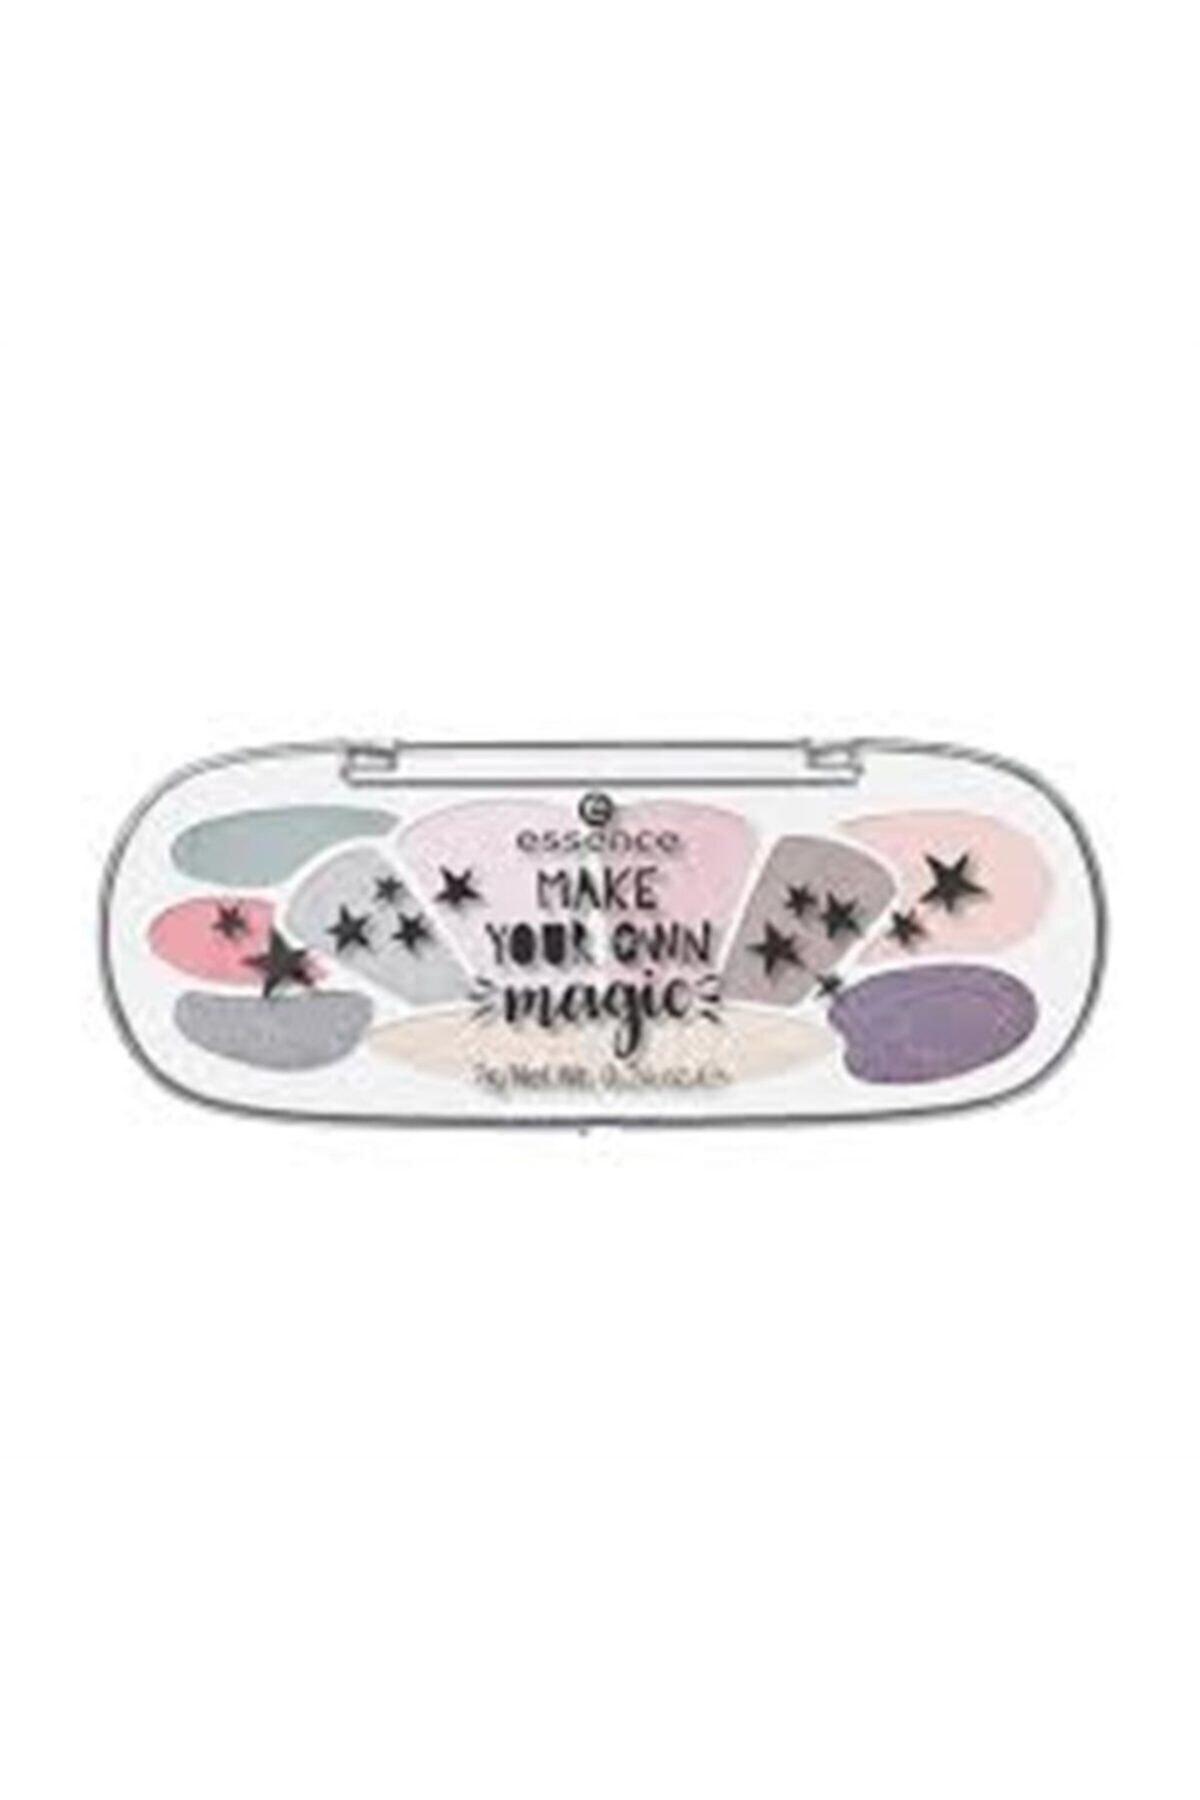 Essence Make Your Own Magic Eyeshadow Box Palet Göz Farı 06 1